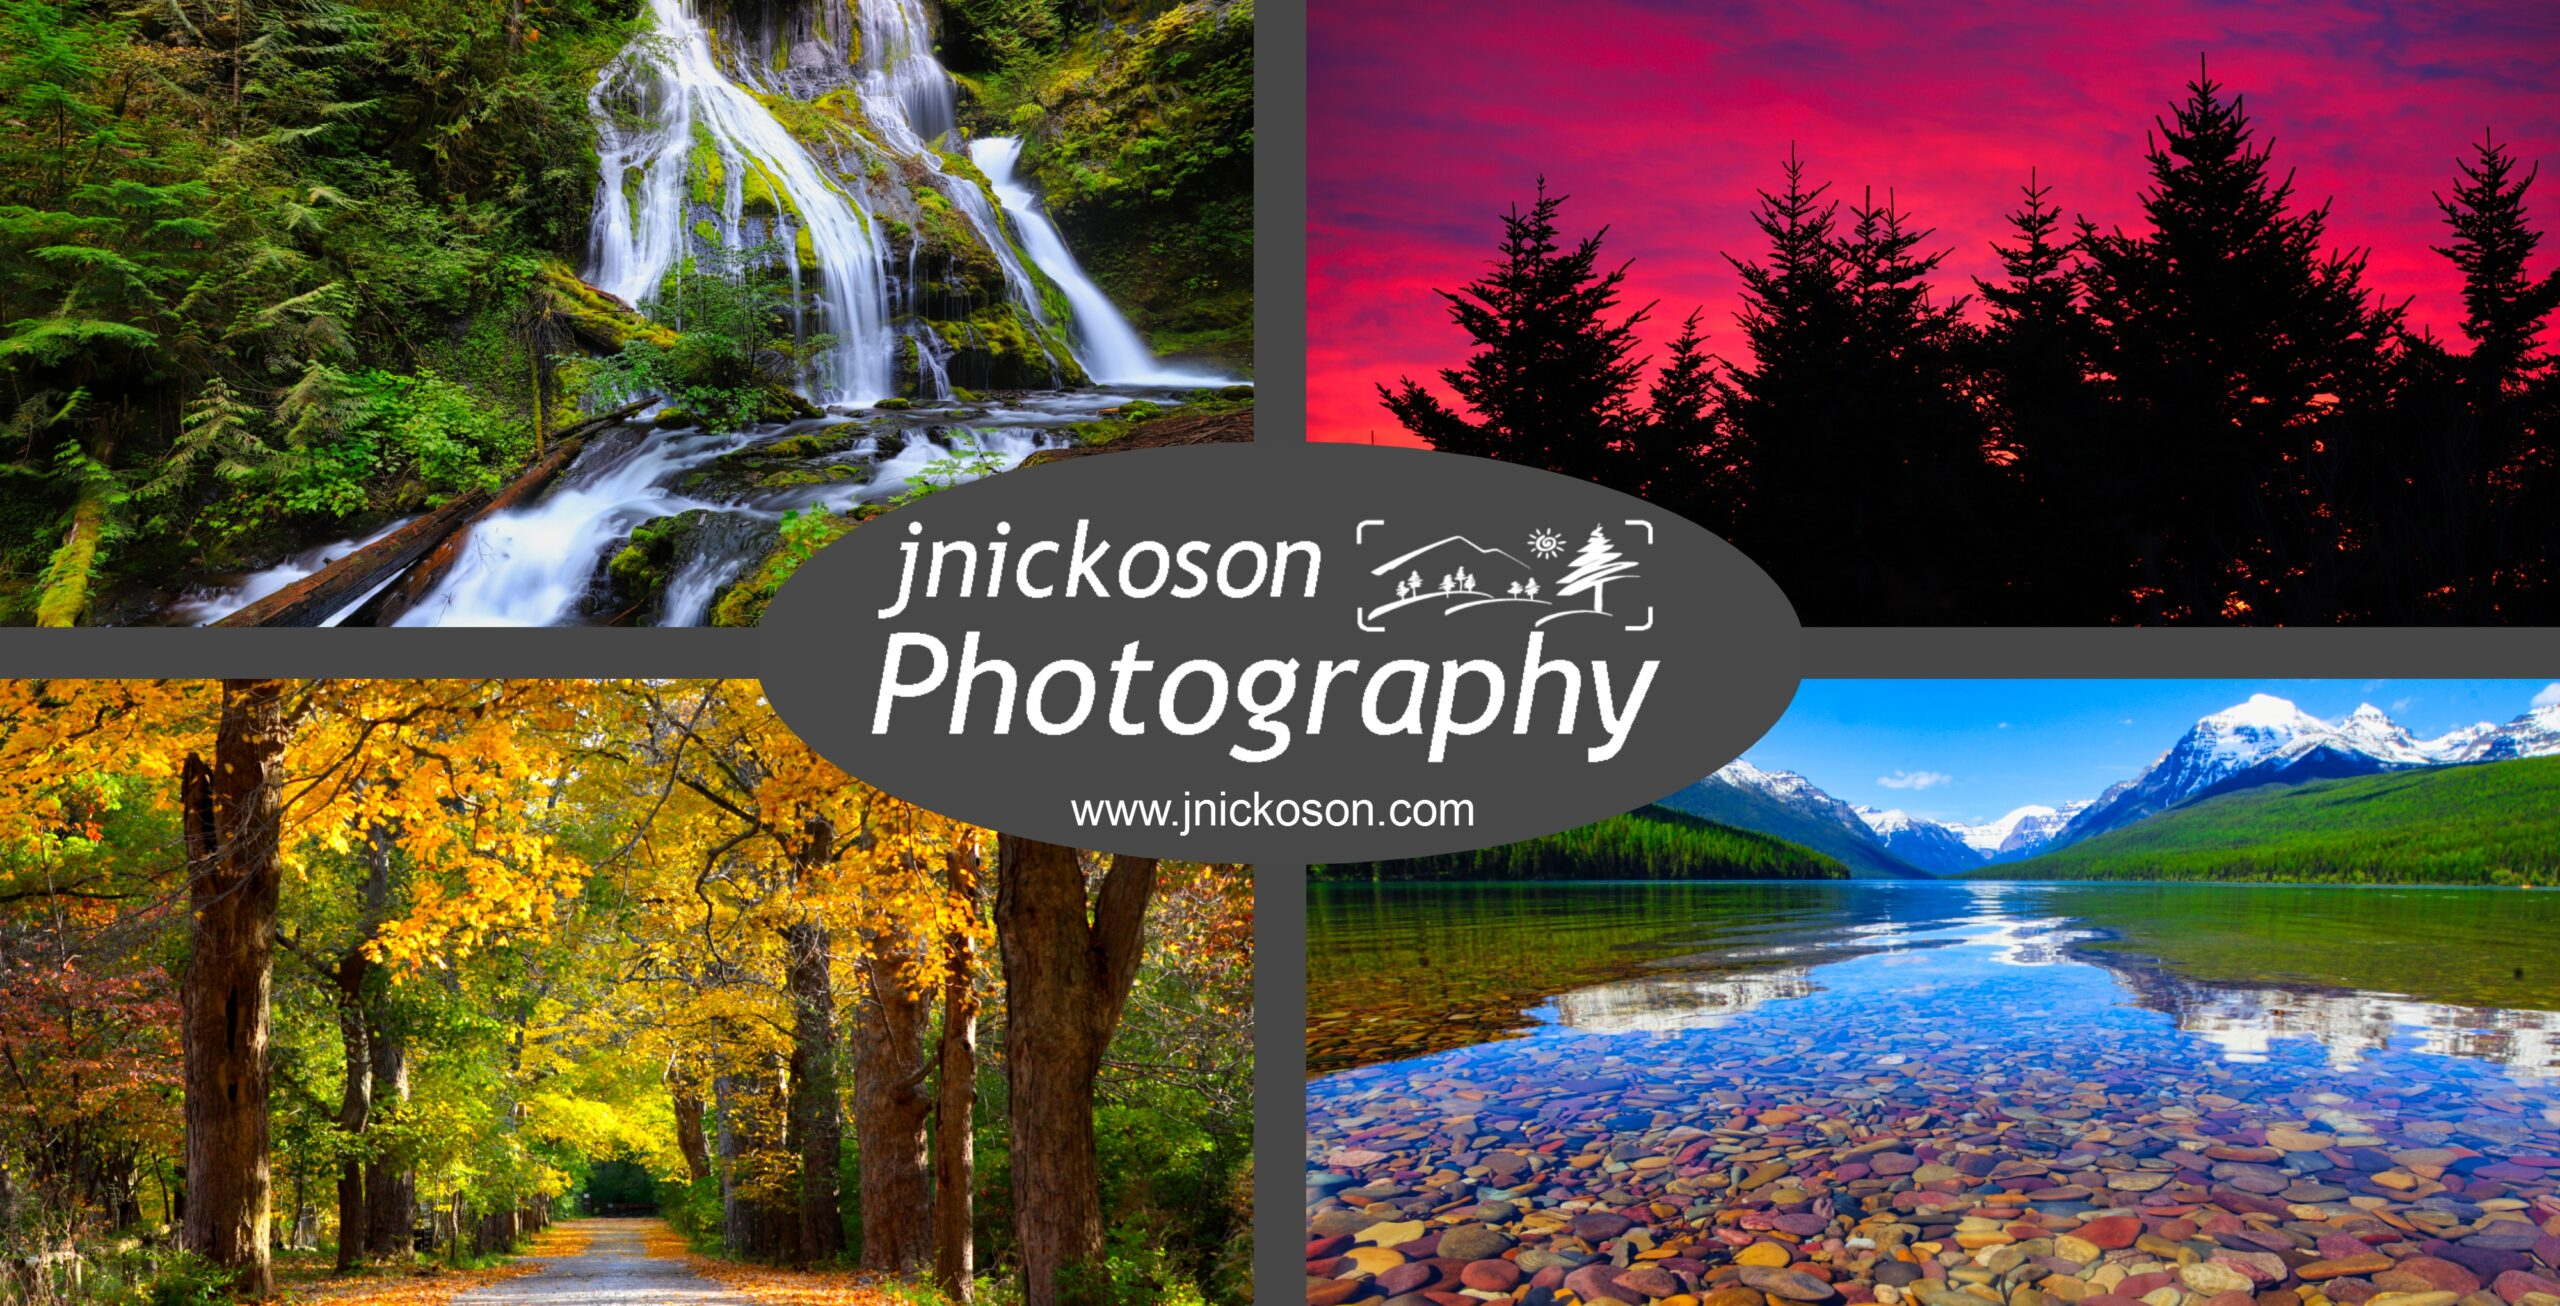 jnickoson Photography